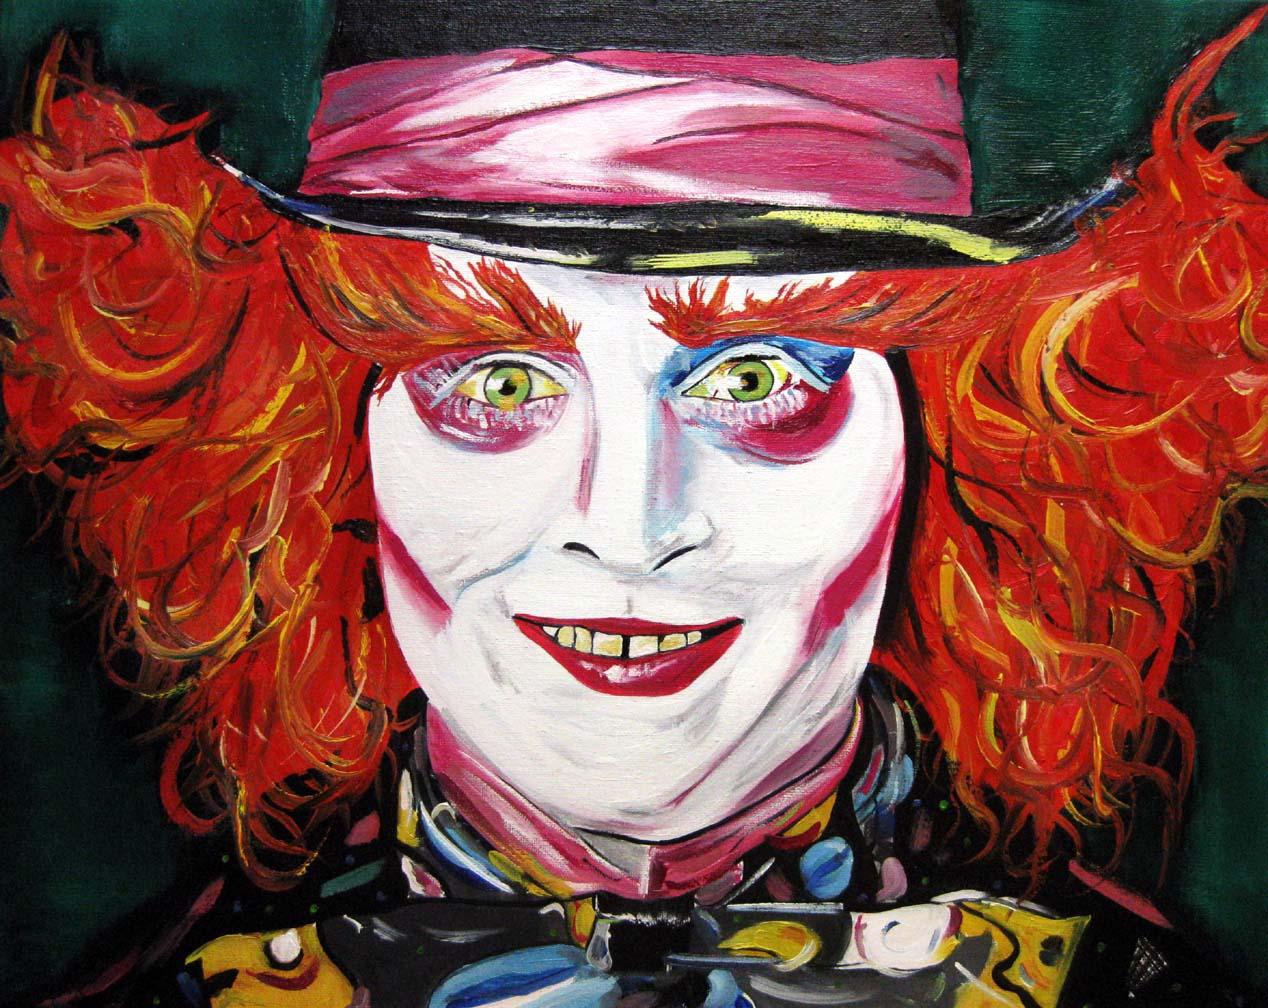 Johnny Depp as Mad Hatter - Angela Loennig - Artwork ... джонни депп фильмы